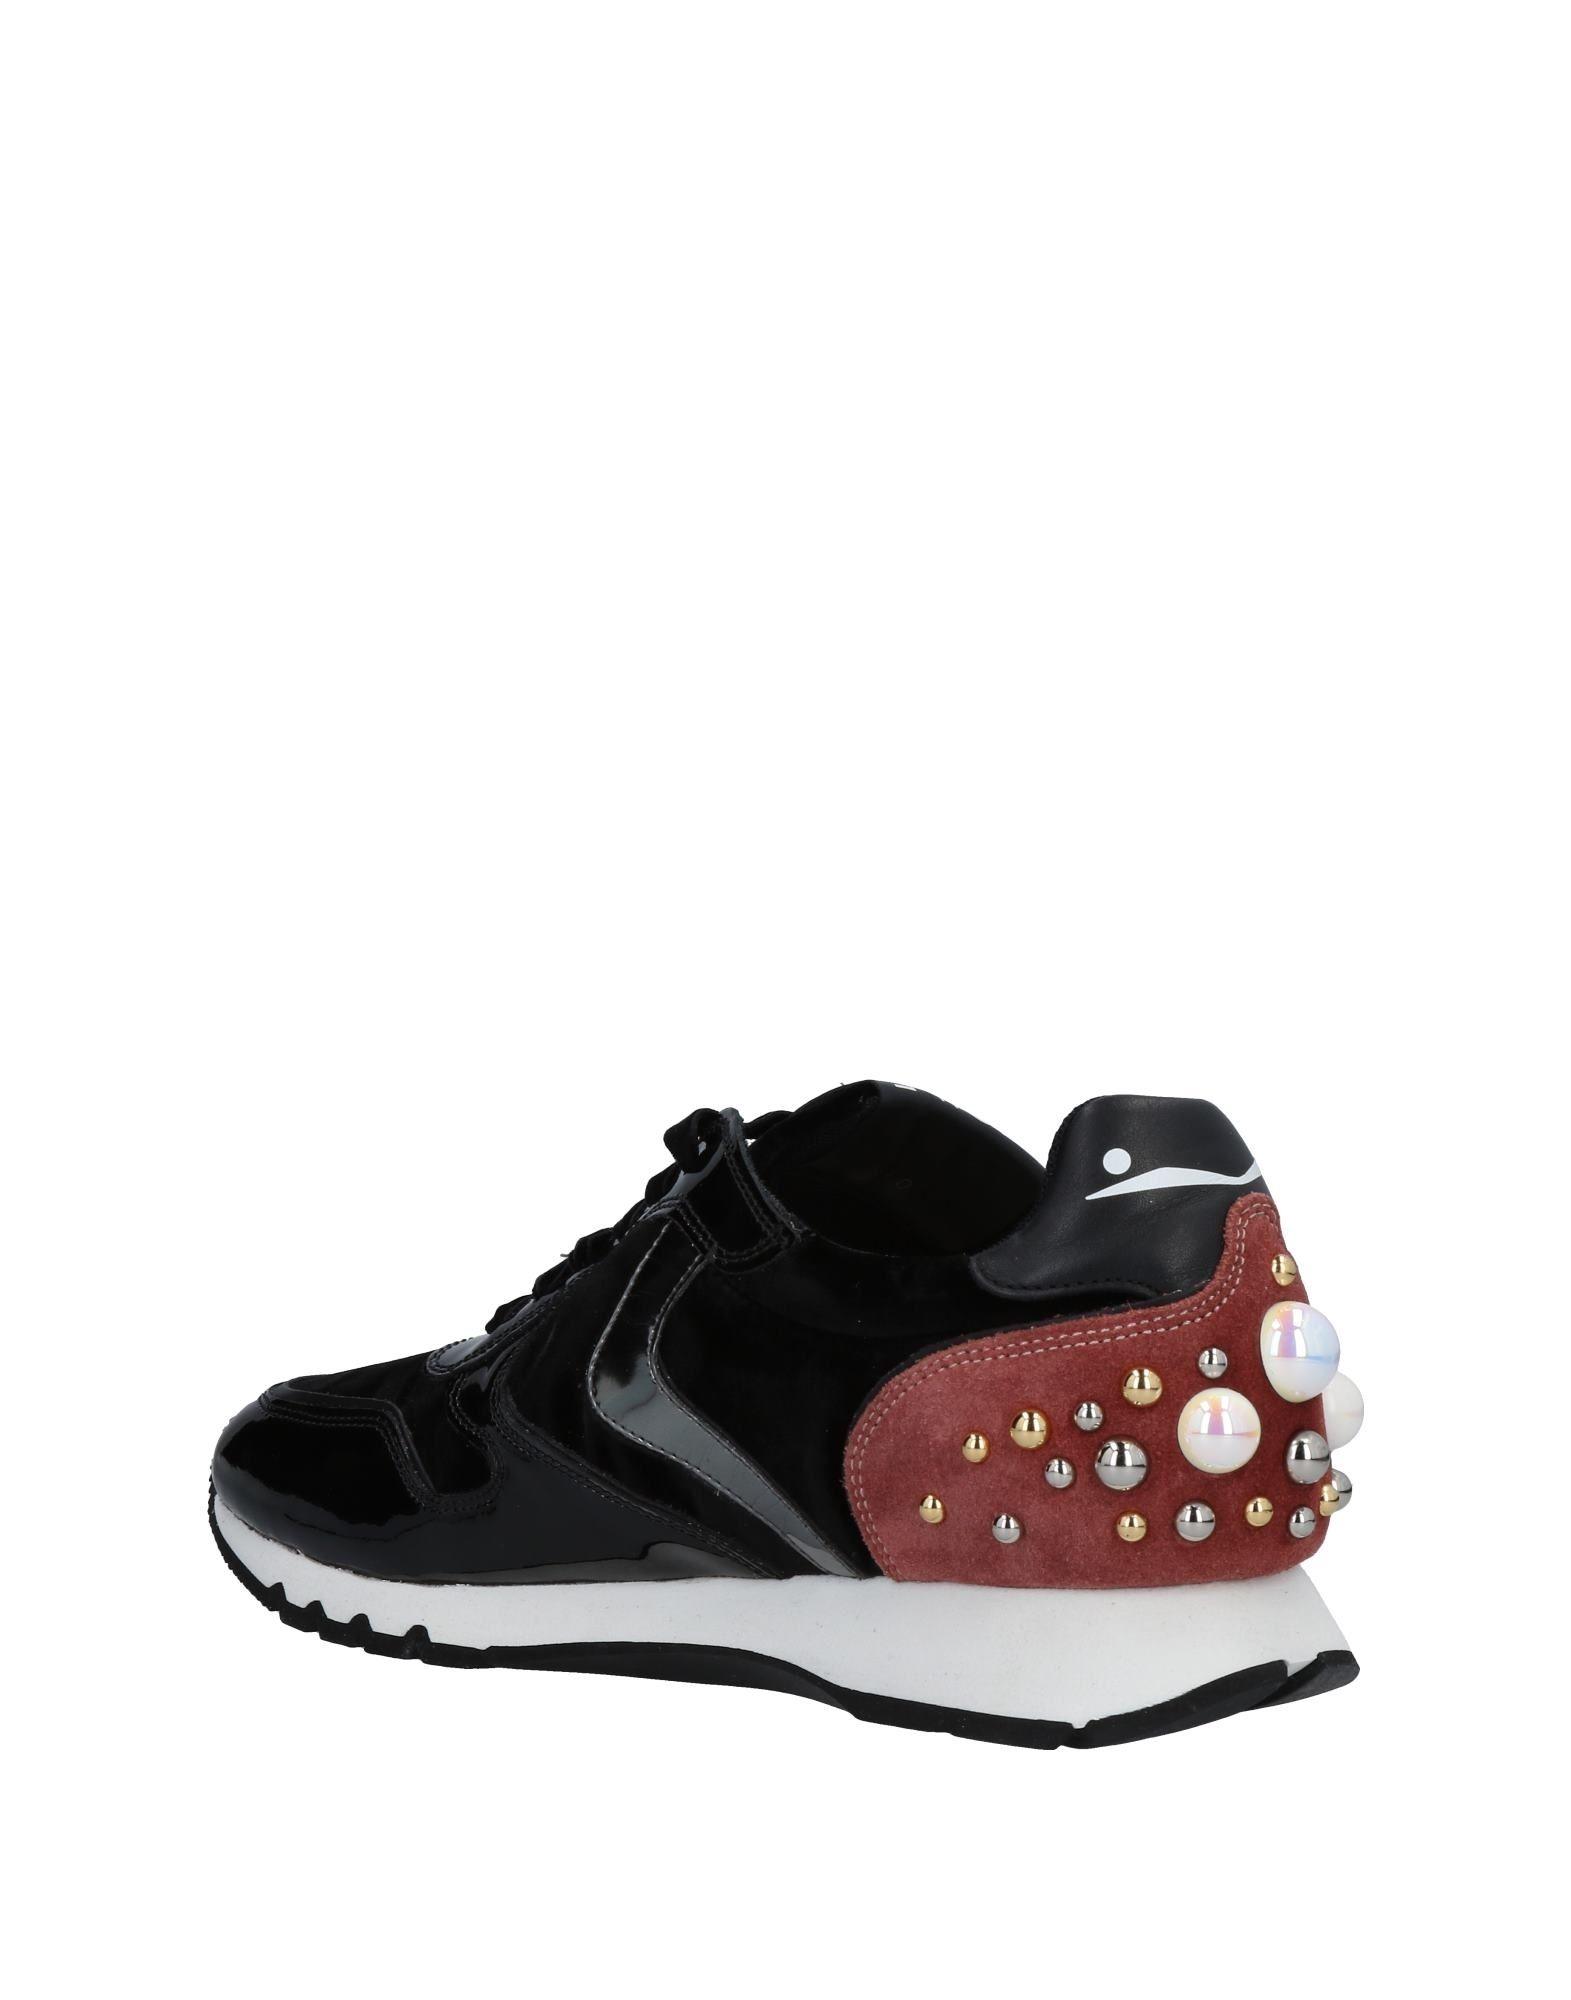 Stilvolle Stilvolle Stilvolle billige Schuhe Voile Blanche Sneakers Damen  11480213VE 8d30e8